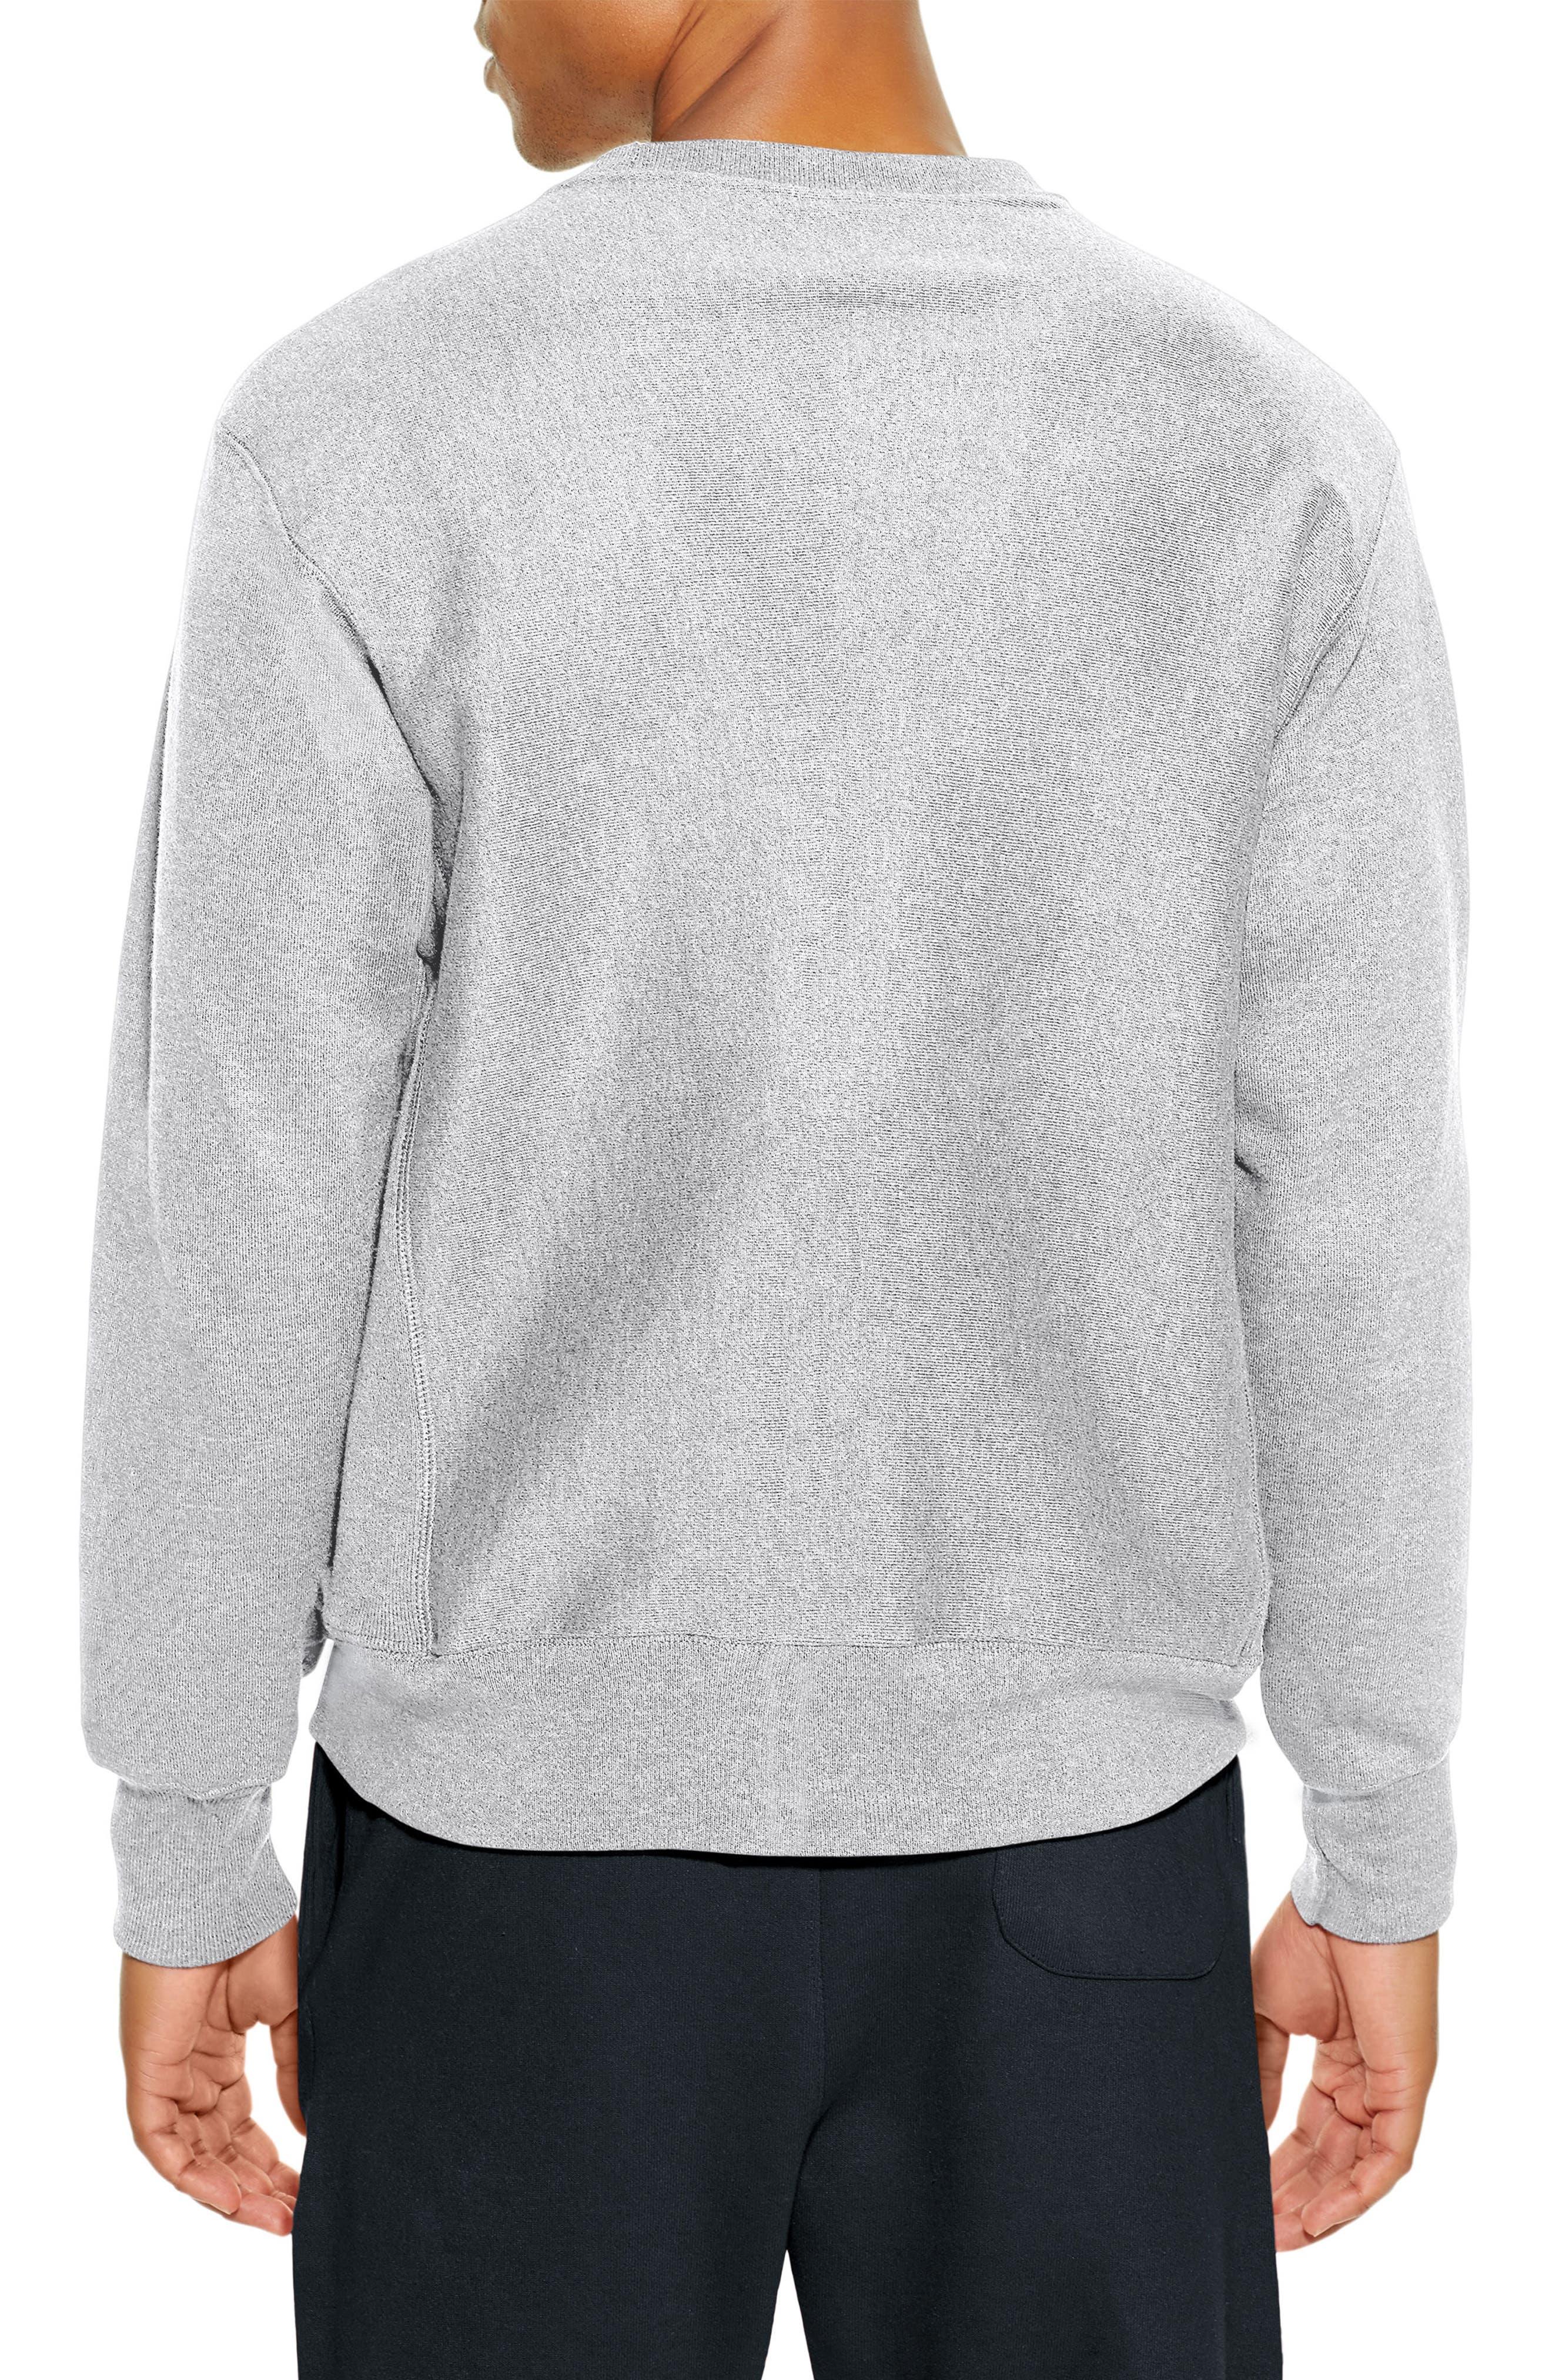 Reverse Weave Crewneck Cotton Blend Sweatshirt,                             Alternate thumbnail 2, color,                             OXFORD GRAY